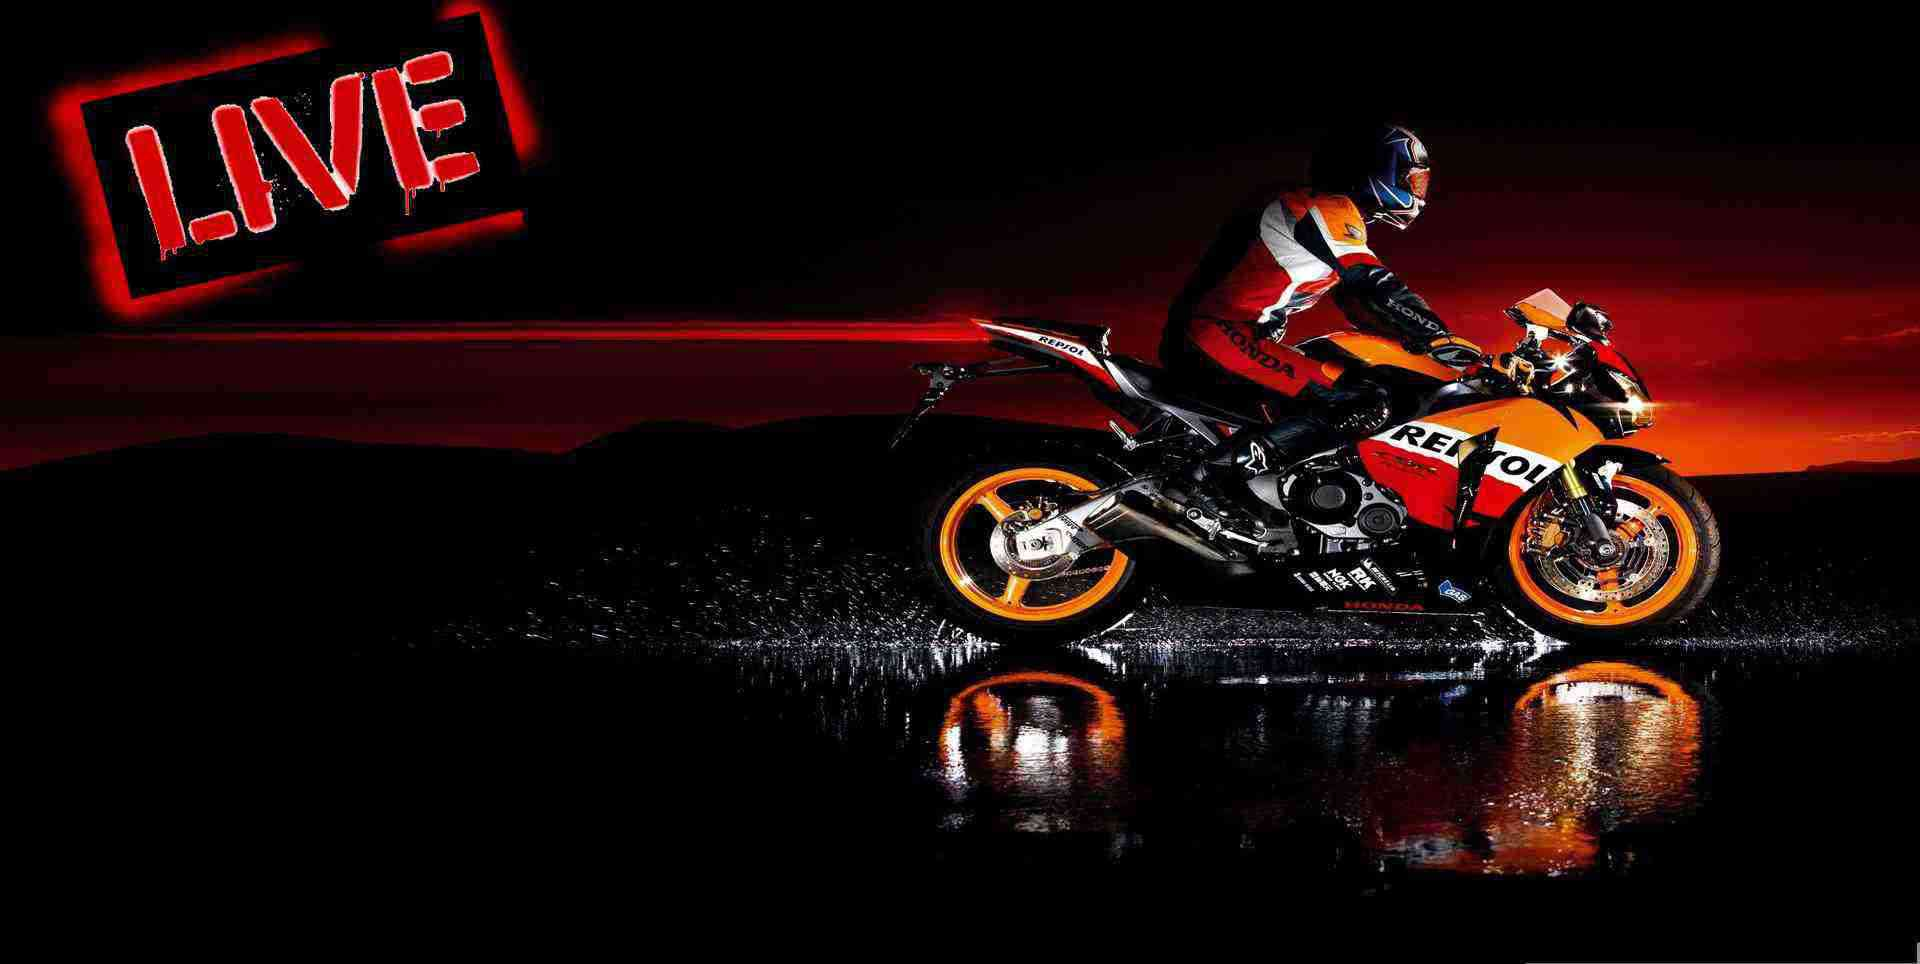 MotoGP Grand Prix of Czech Republic 2015 Streaming